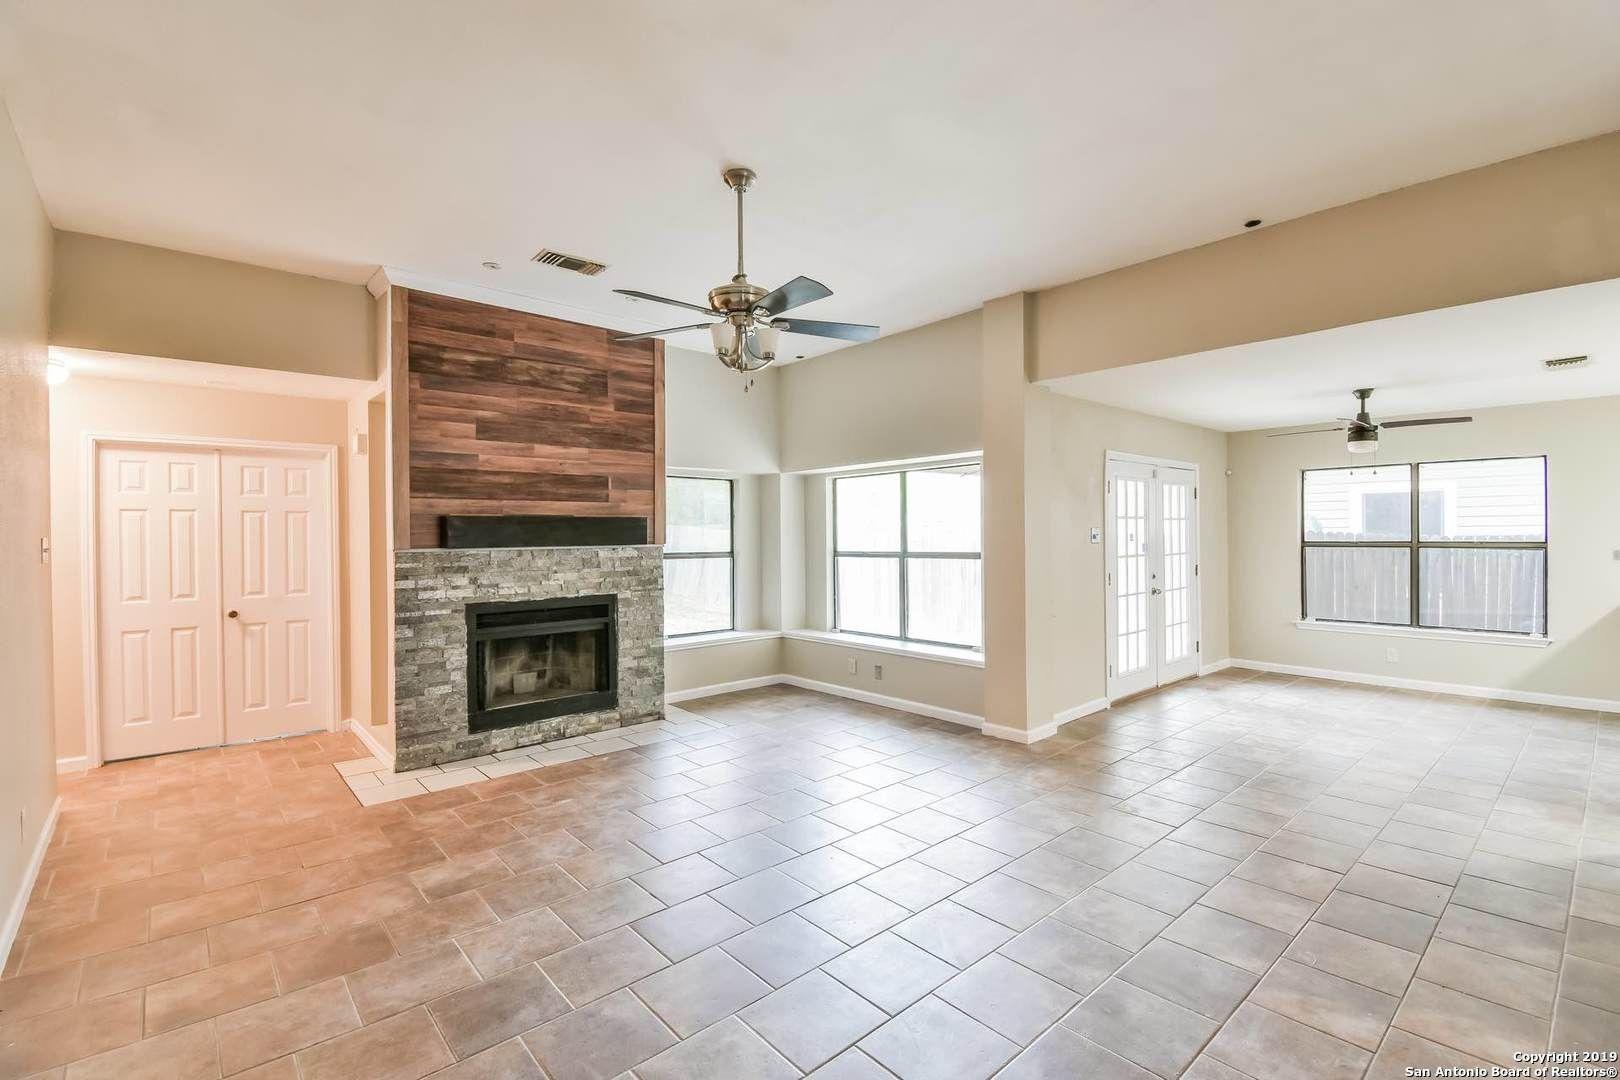 RENTTOOWN THIS HOME! (San Antonio, TX 78244)🎈 3 beds 2